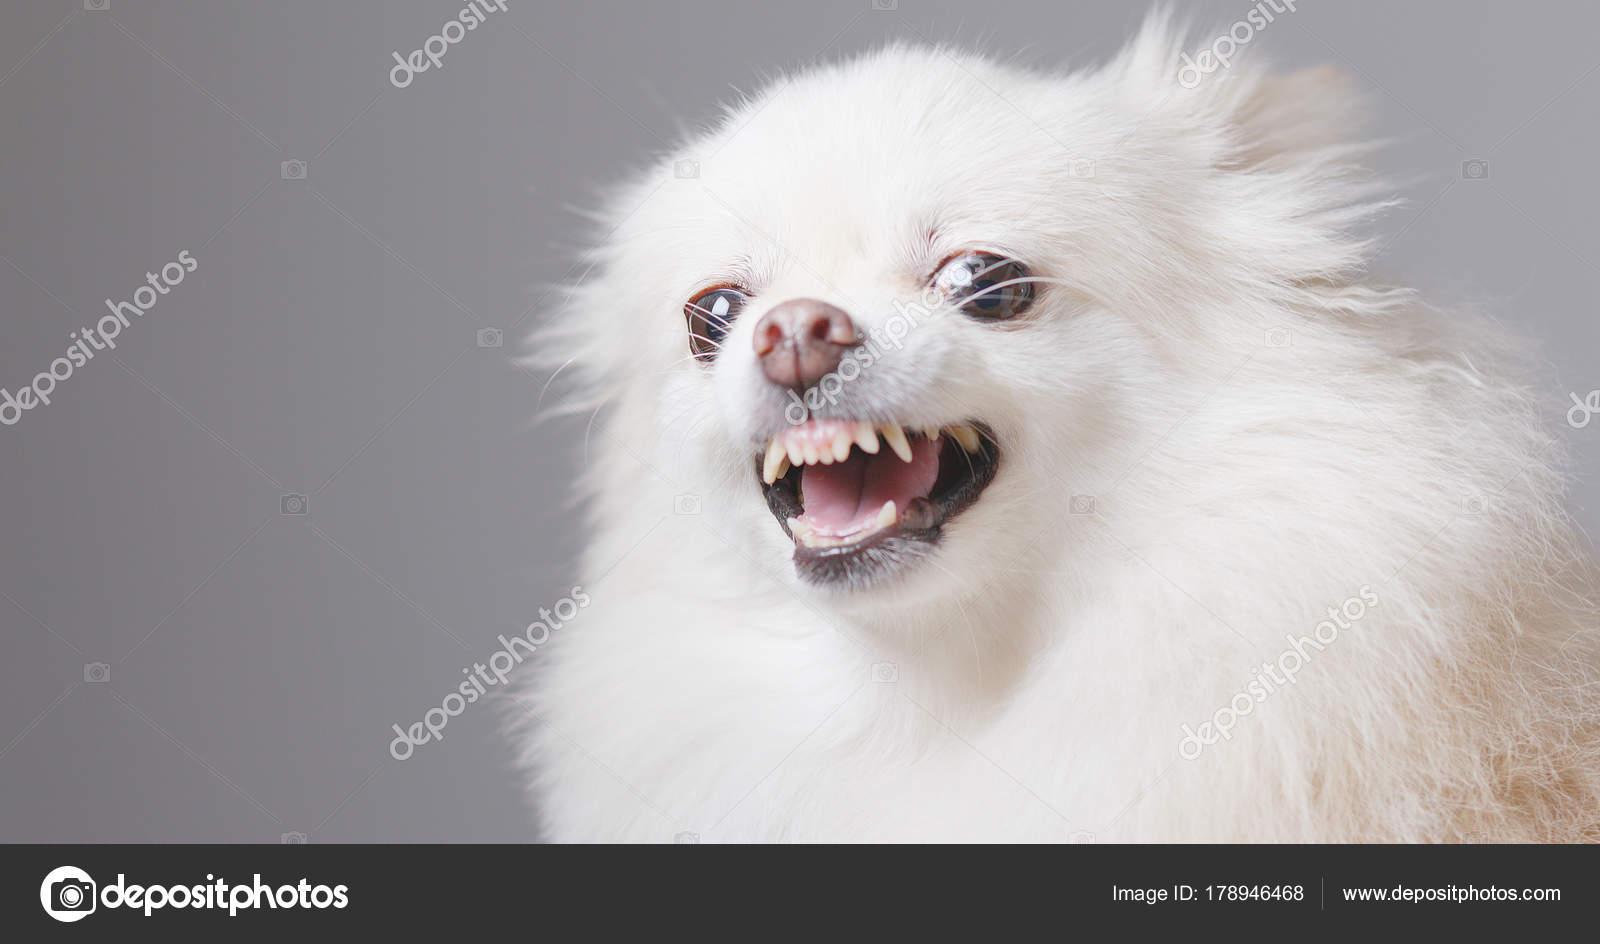 Angry pomeranian dog close stock photo leungchopan 178946468 angry pomeranian dog close up photo by leungchopan altavistaventures Images